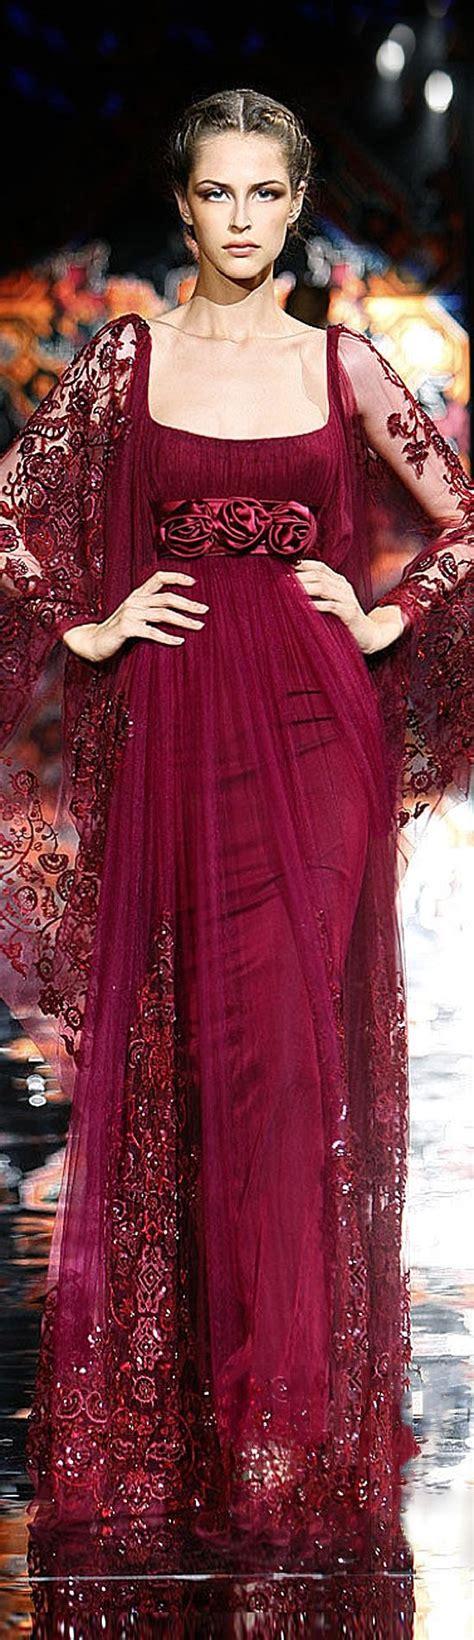 Dress Noriko check out the zuhair murad dresses collection noriko